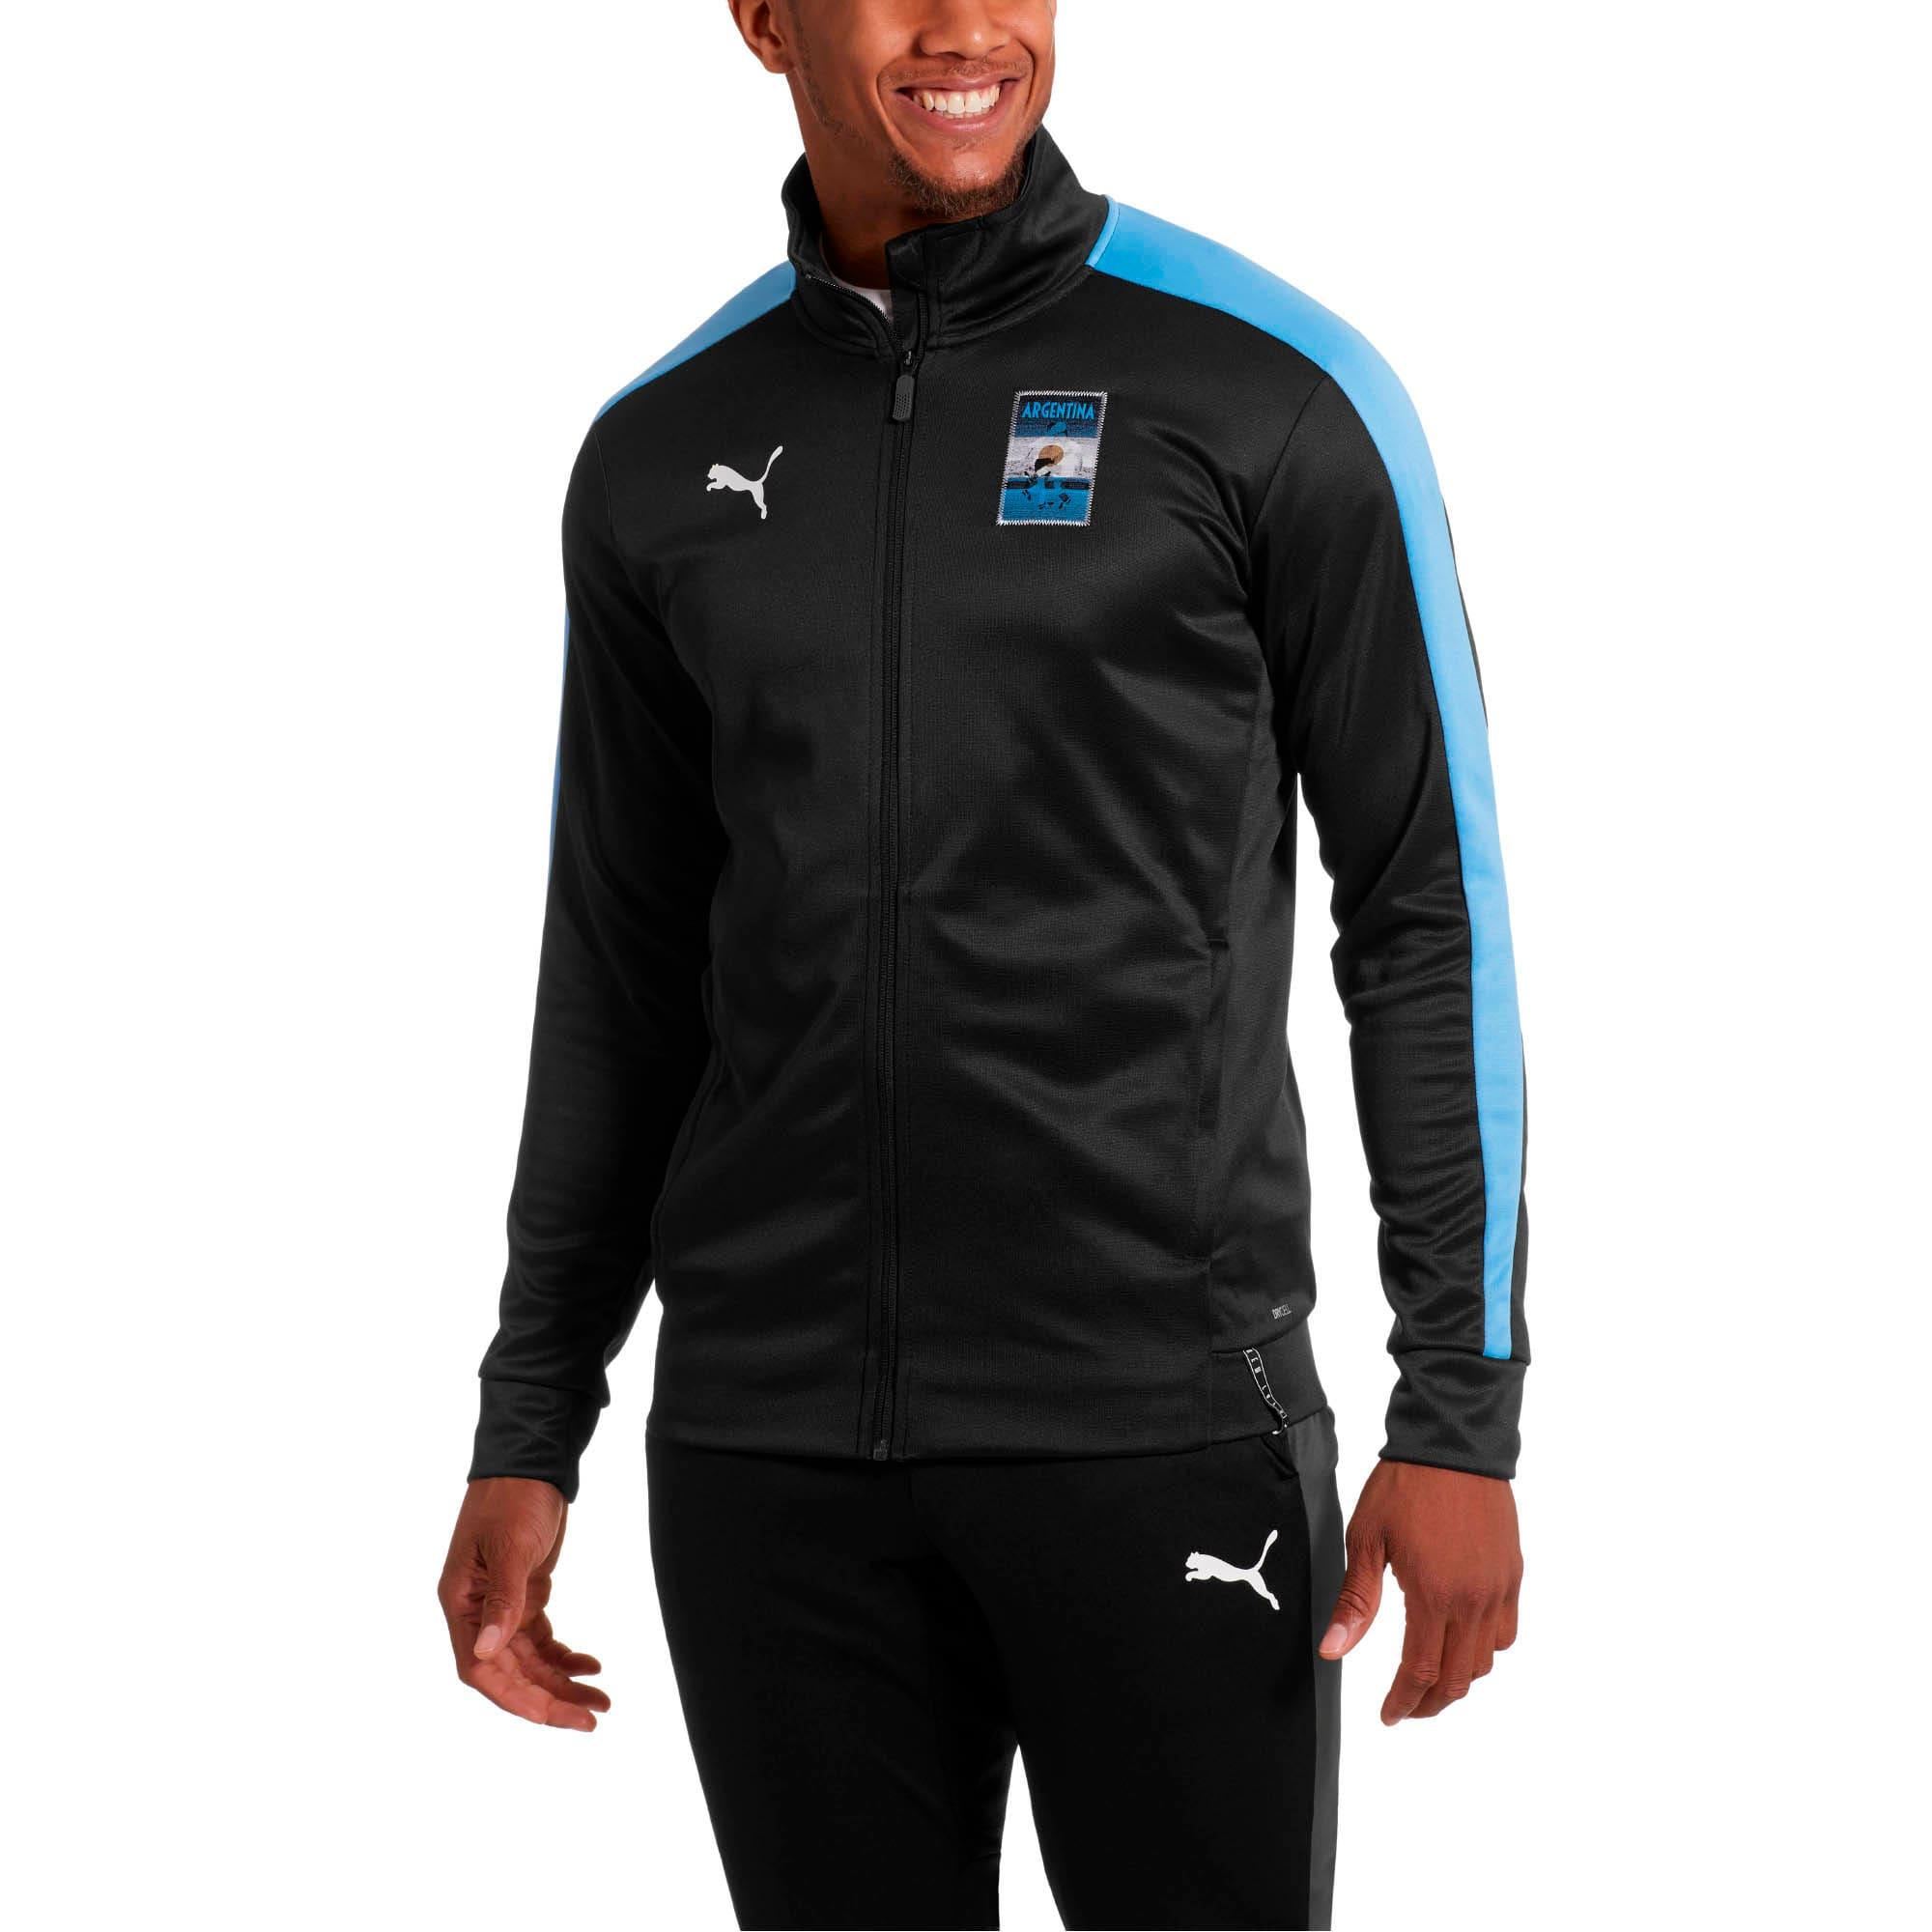 Thumbnail 1 of Copa America Men's T7 Track Jacket, Puma Black-AZURE BLUE, medium